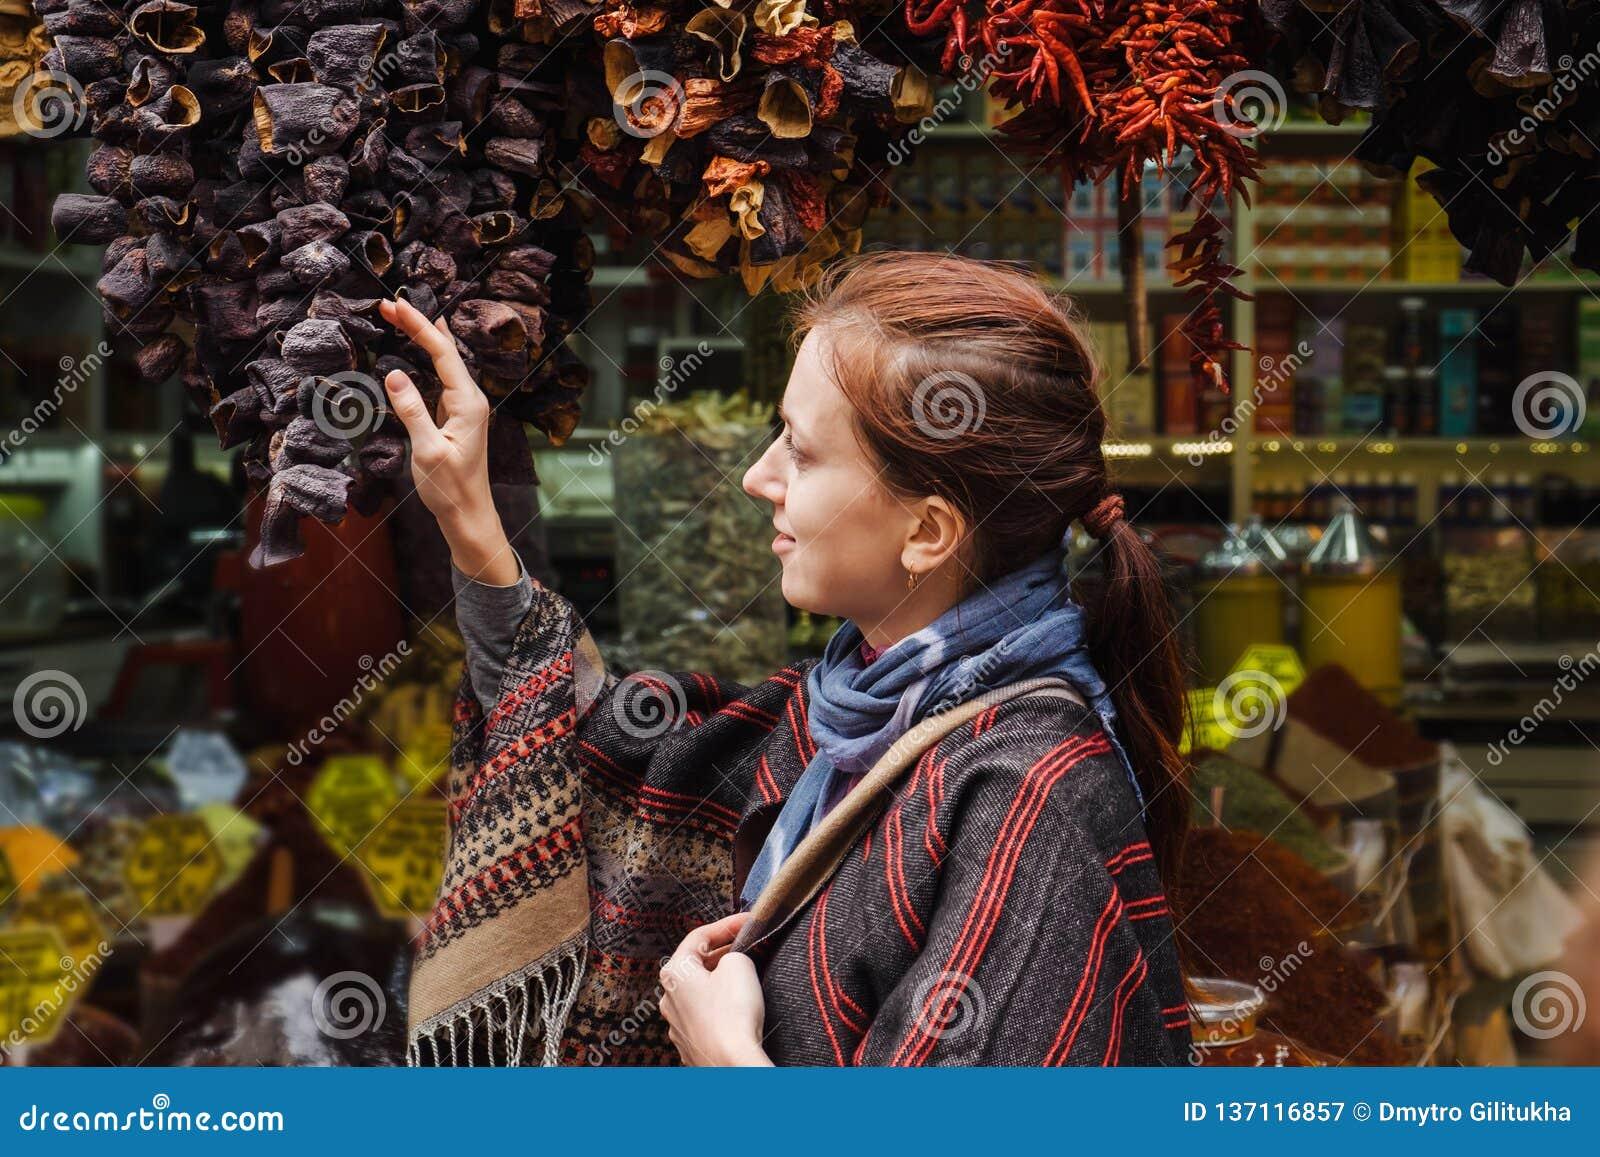 Woman walking on Egyptian spices market in Istanbul, Turkey